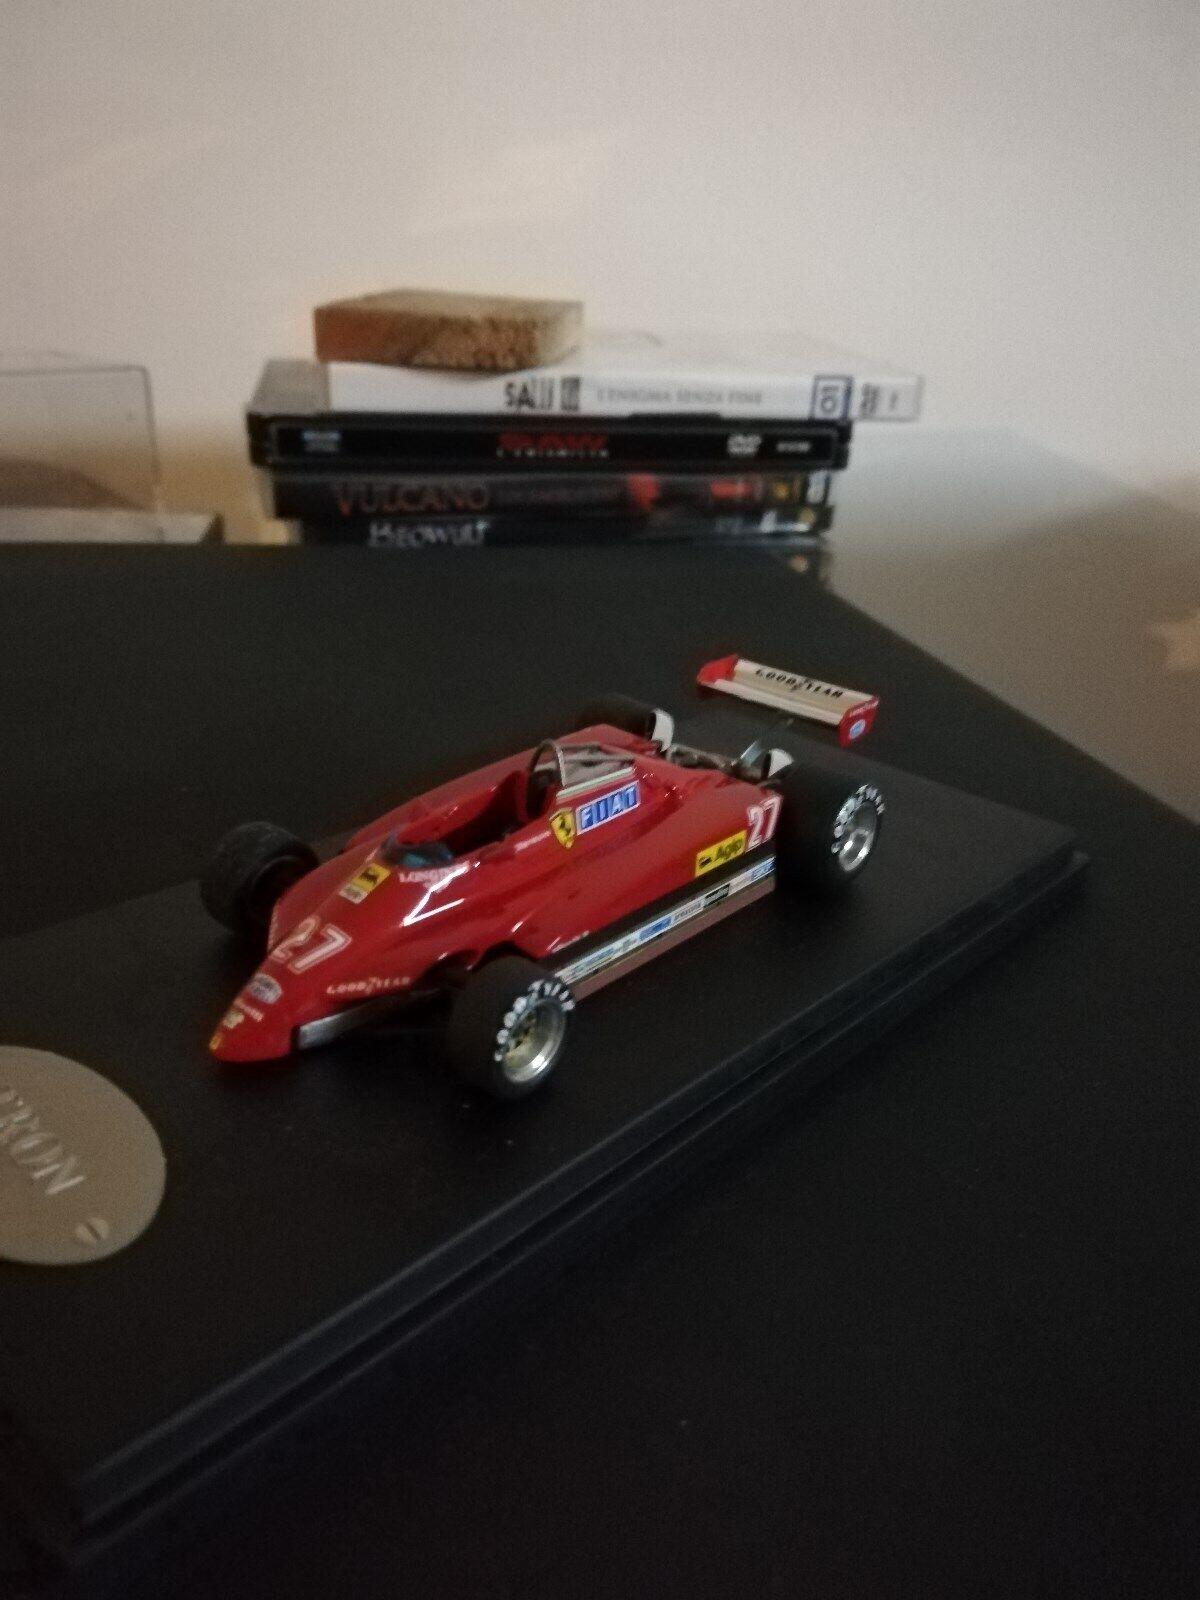 Ferrari 126 C2 Villeneuve San Marino G.P. 1982  27 1 43 Tron No BBR No Tameo